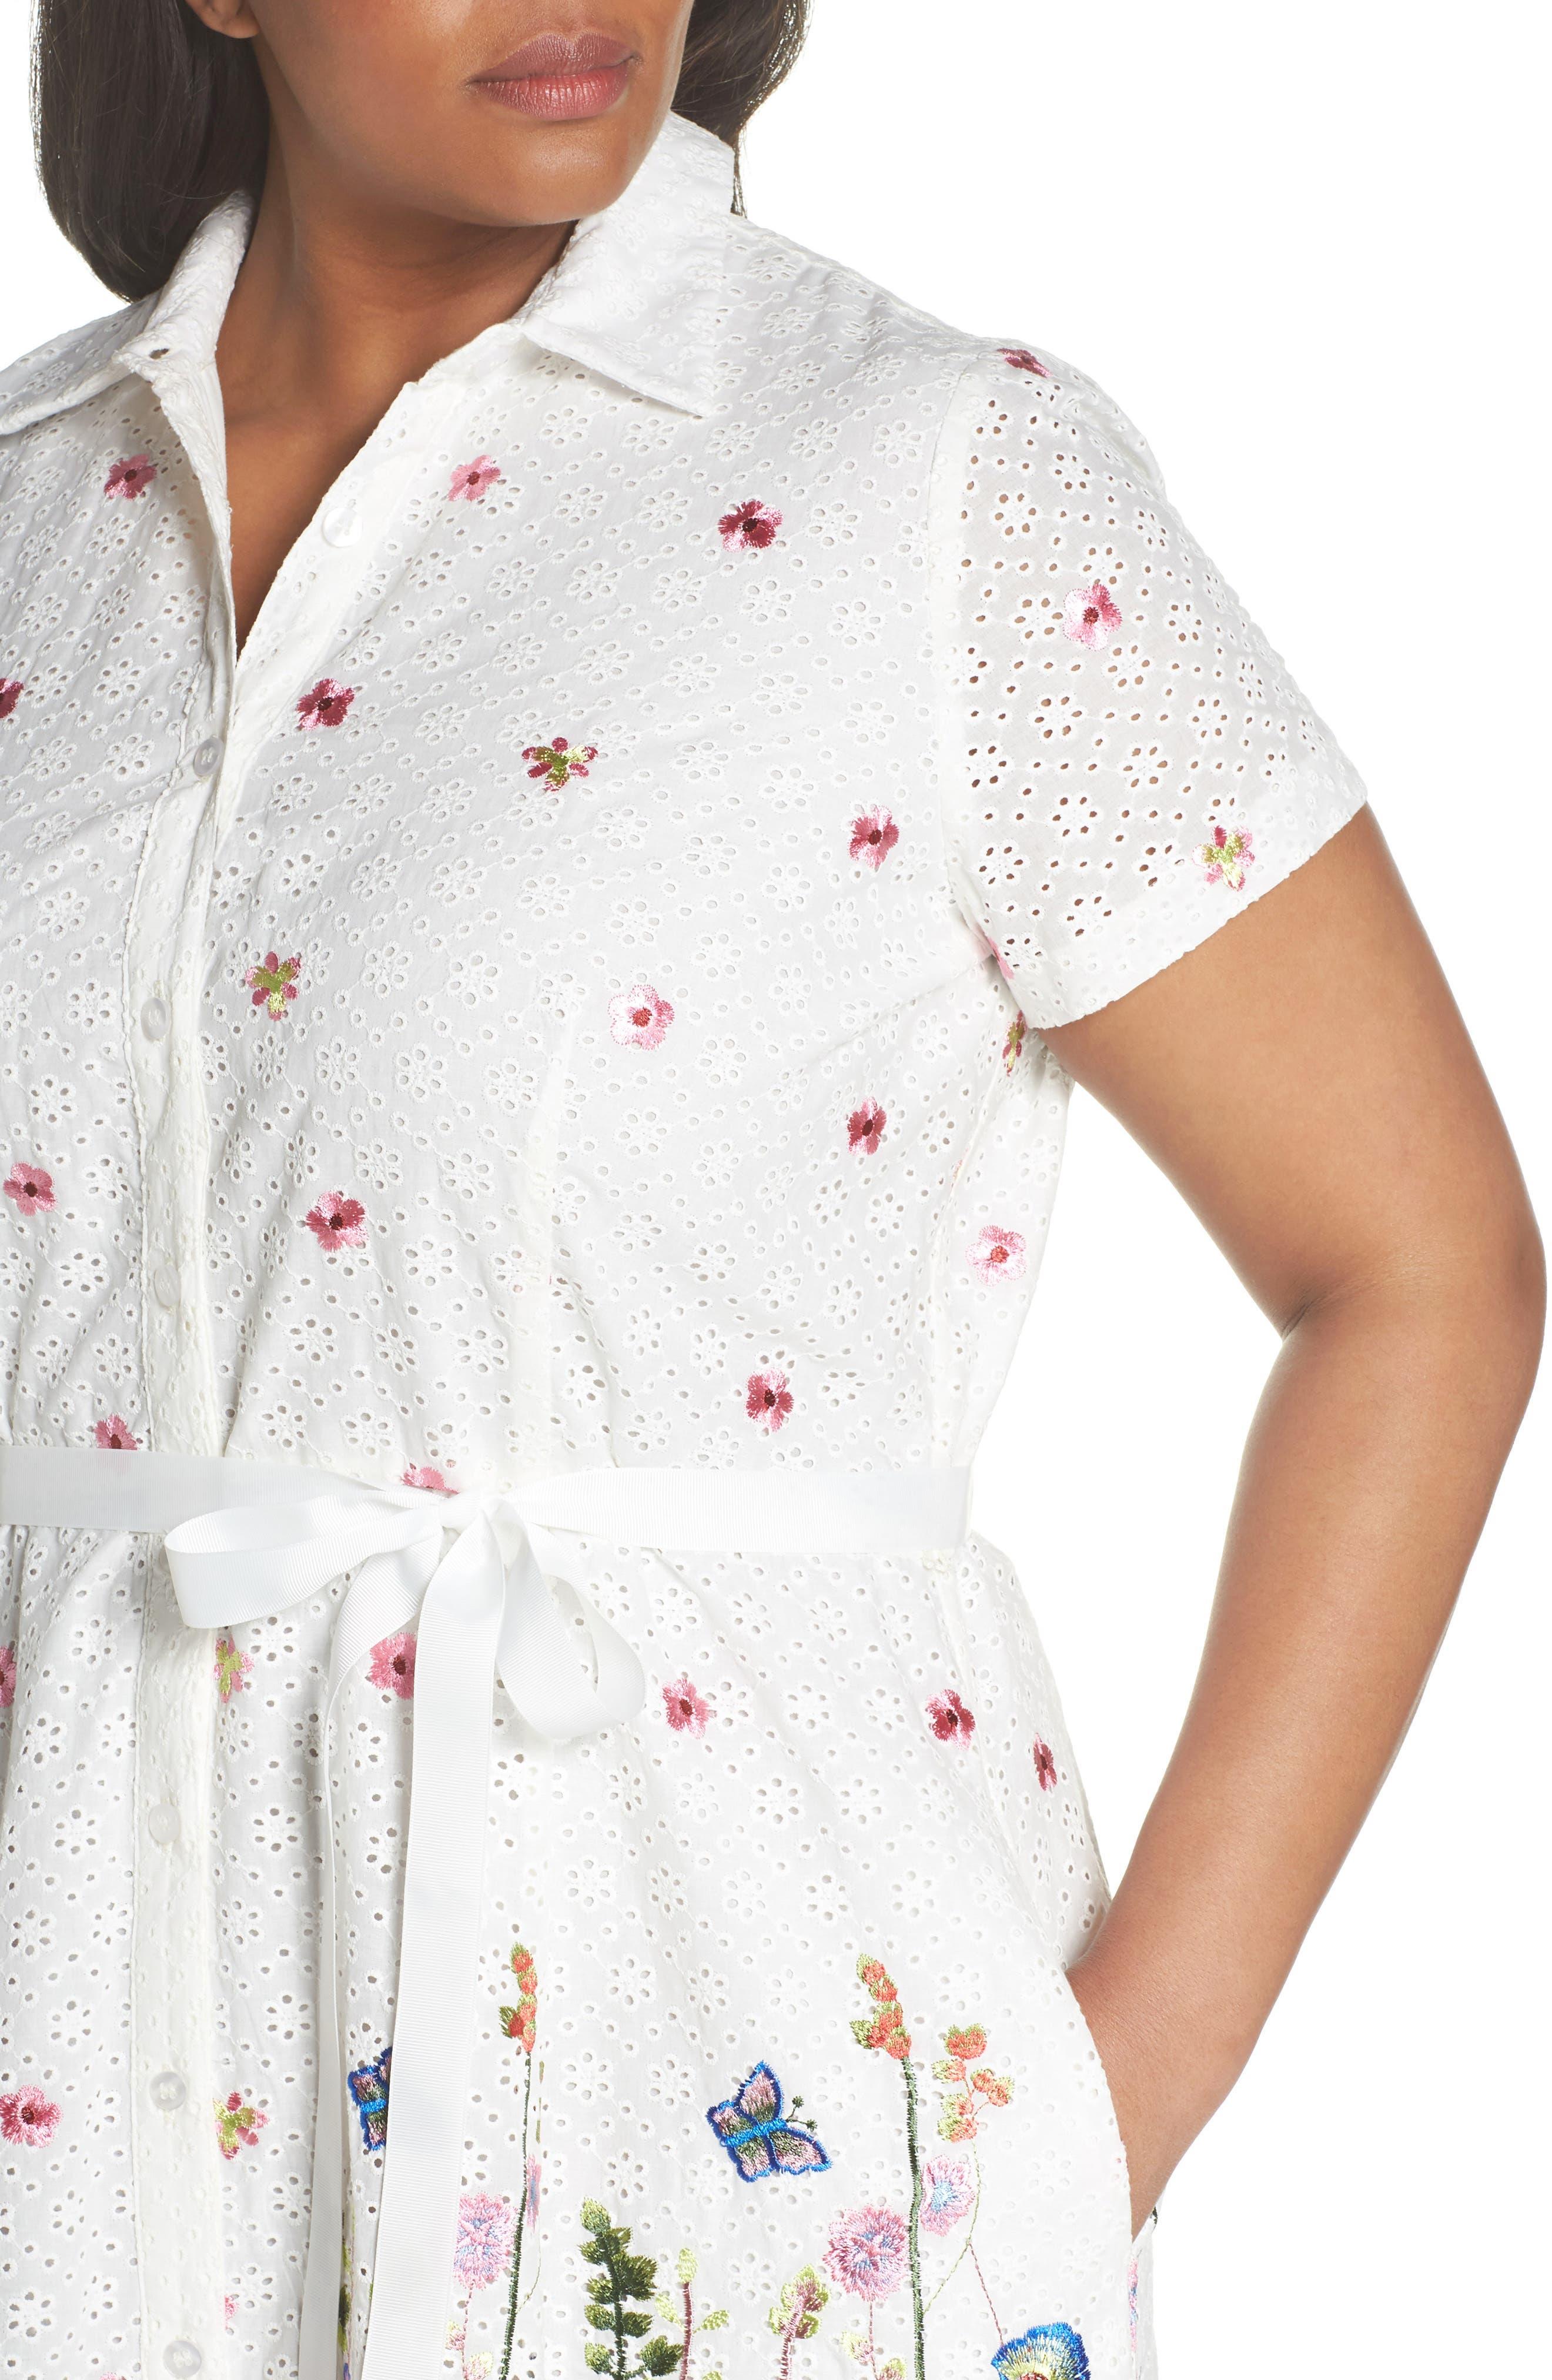 Floral Embroidered Eyelet Shirtdress,                             Alternate thumbnail 4, color,                             White/ Royal/ Green